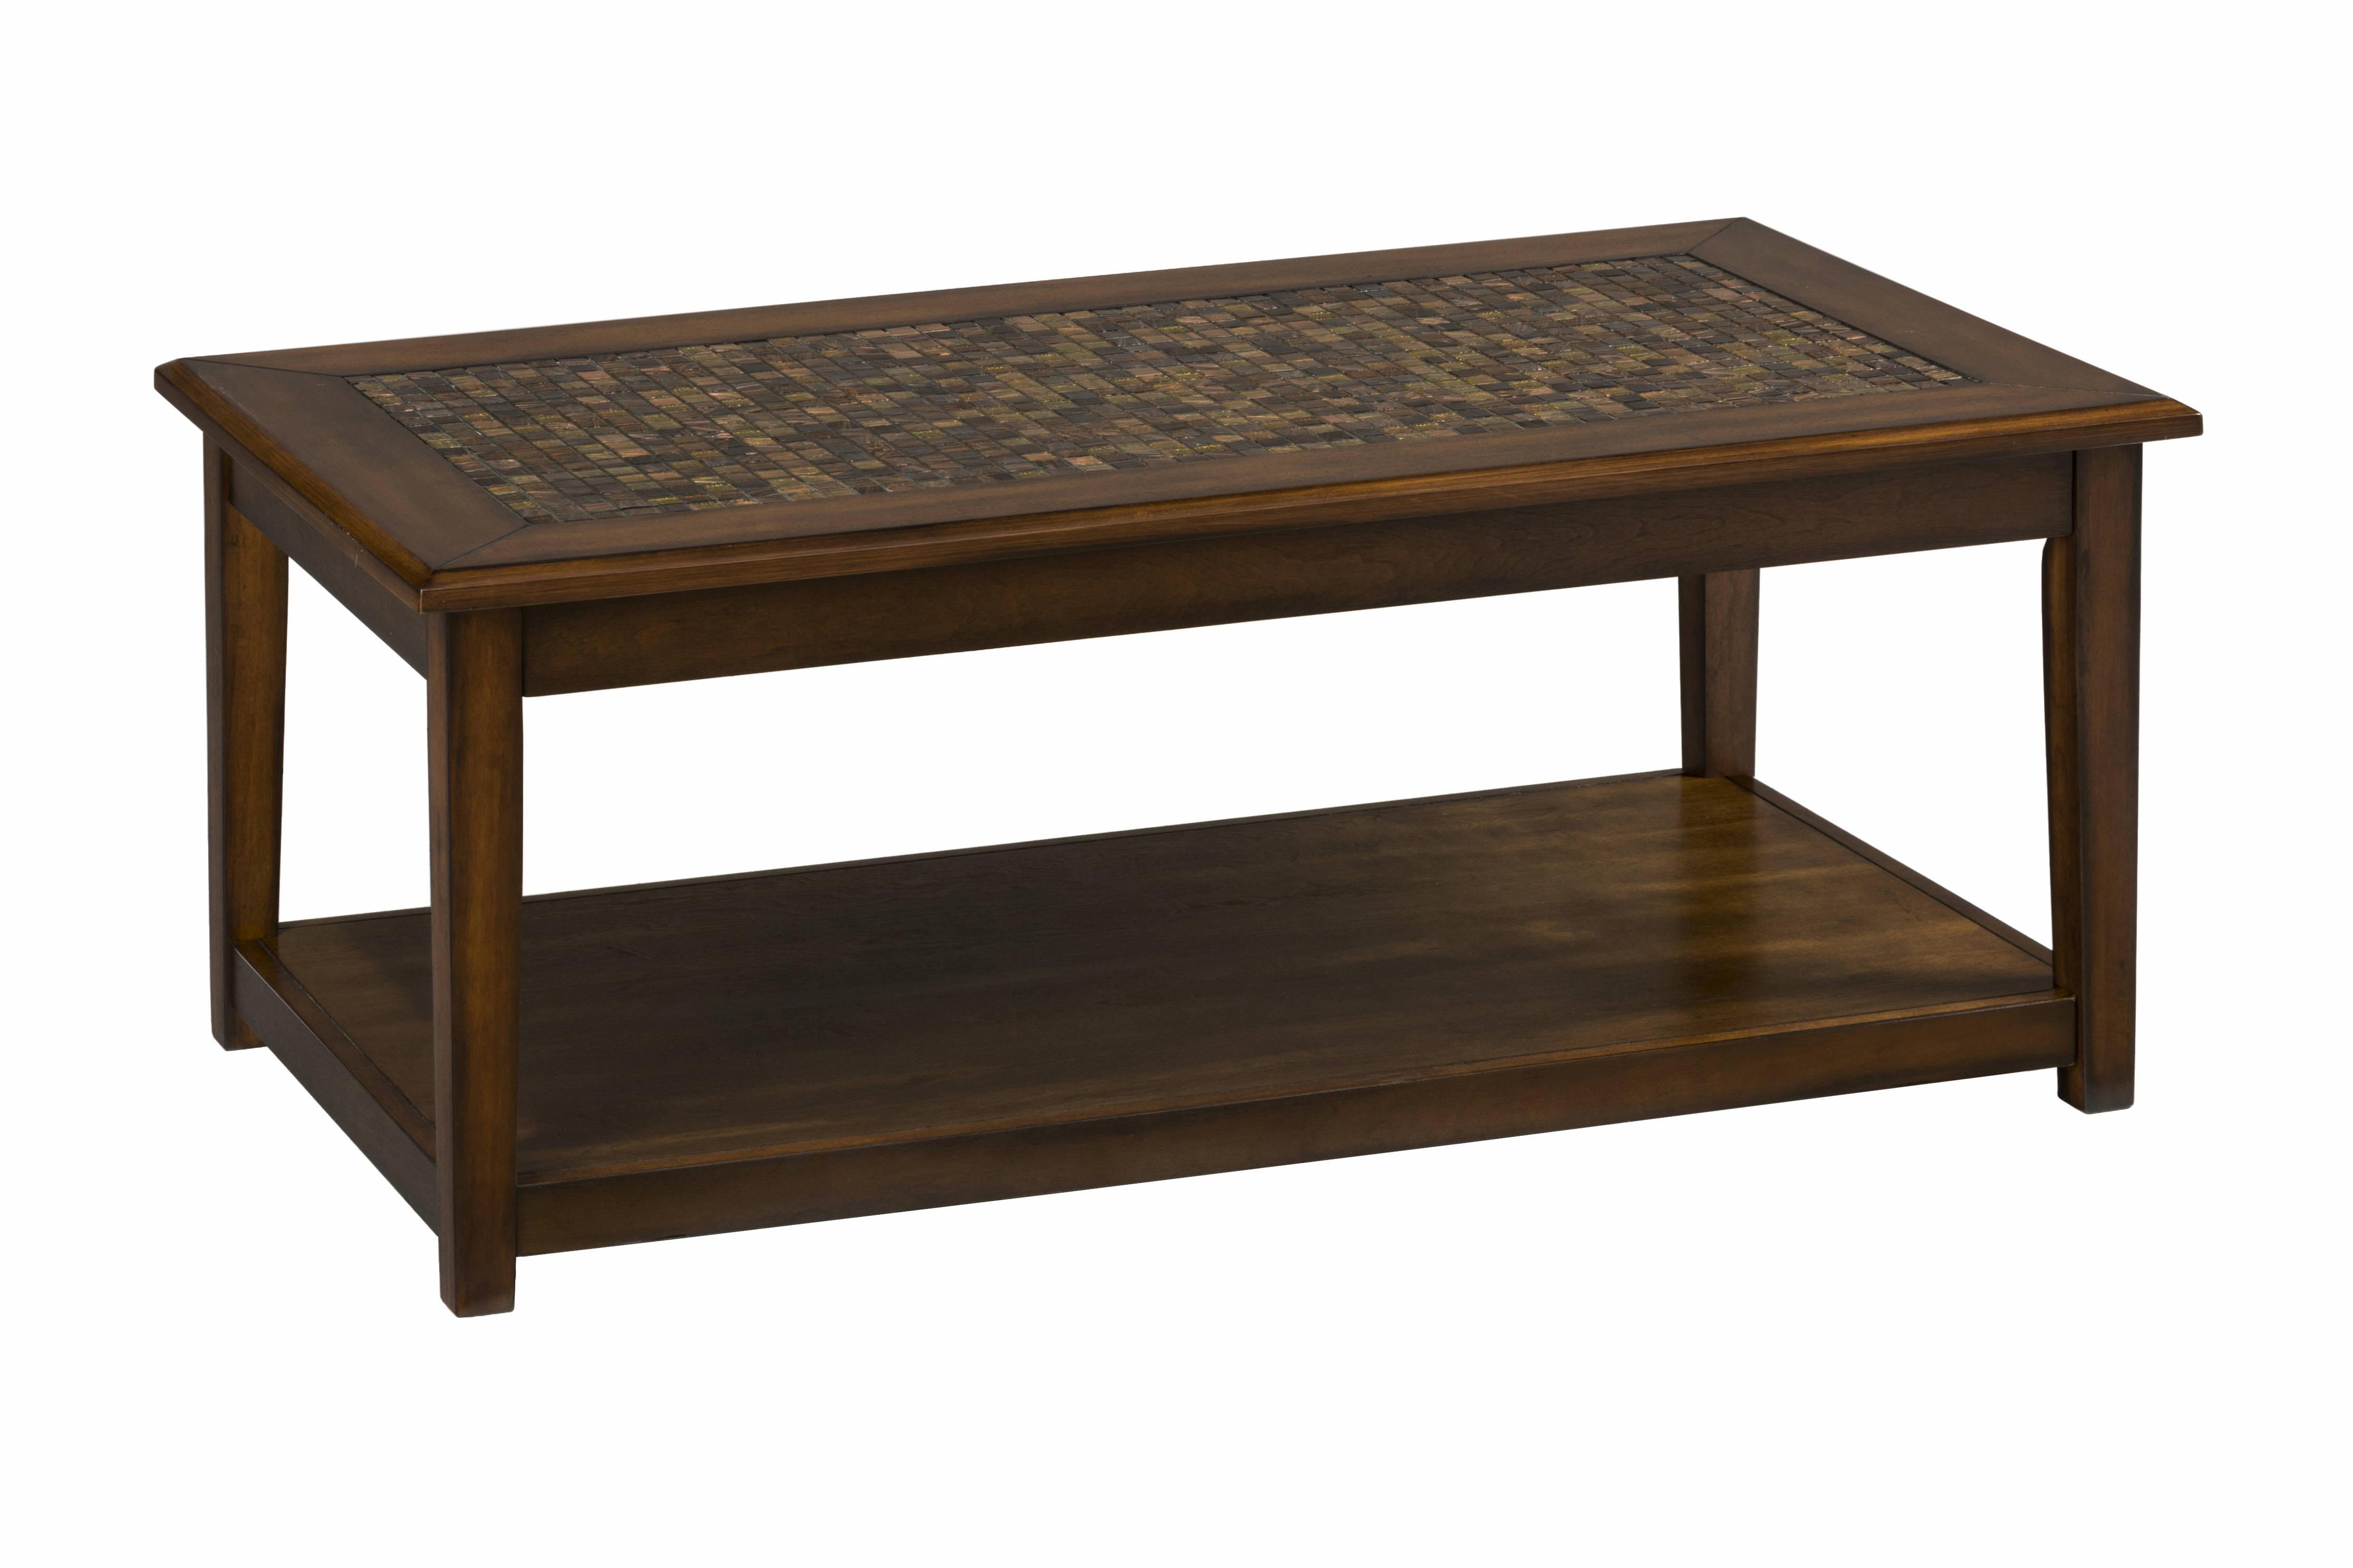 Jofran Furniture Baroque Brown Mosaic Tile Inlay Cocktail Table regarding proportions 4463 X 2975